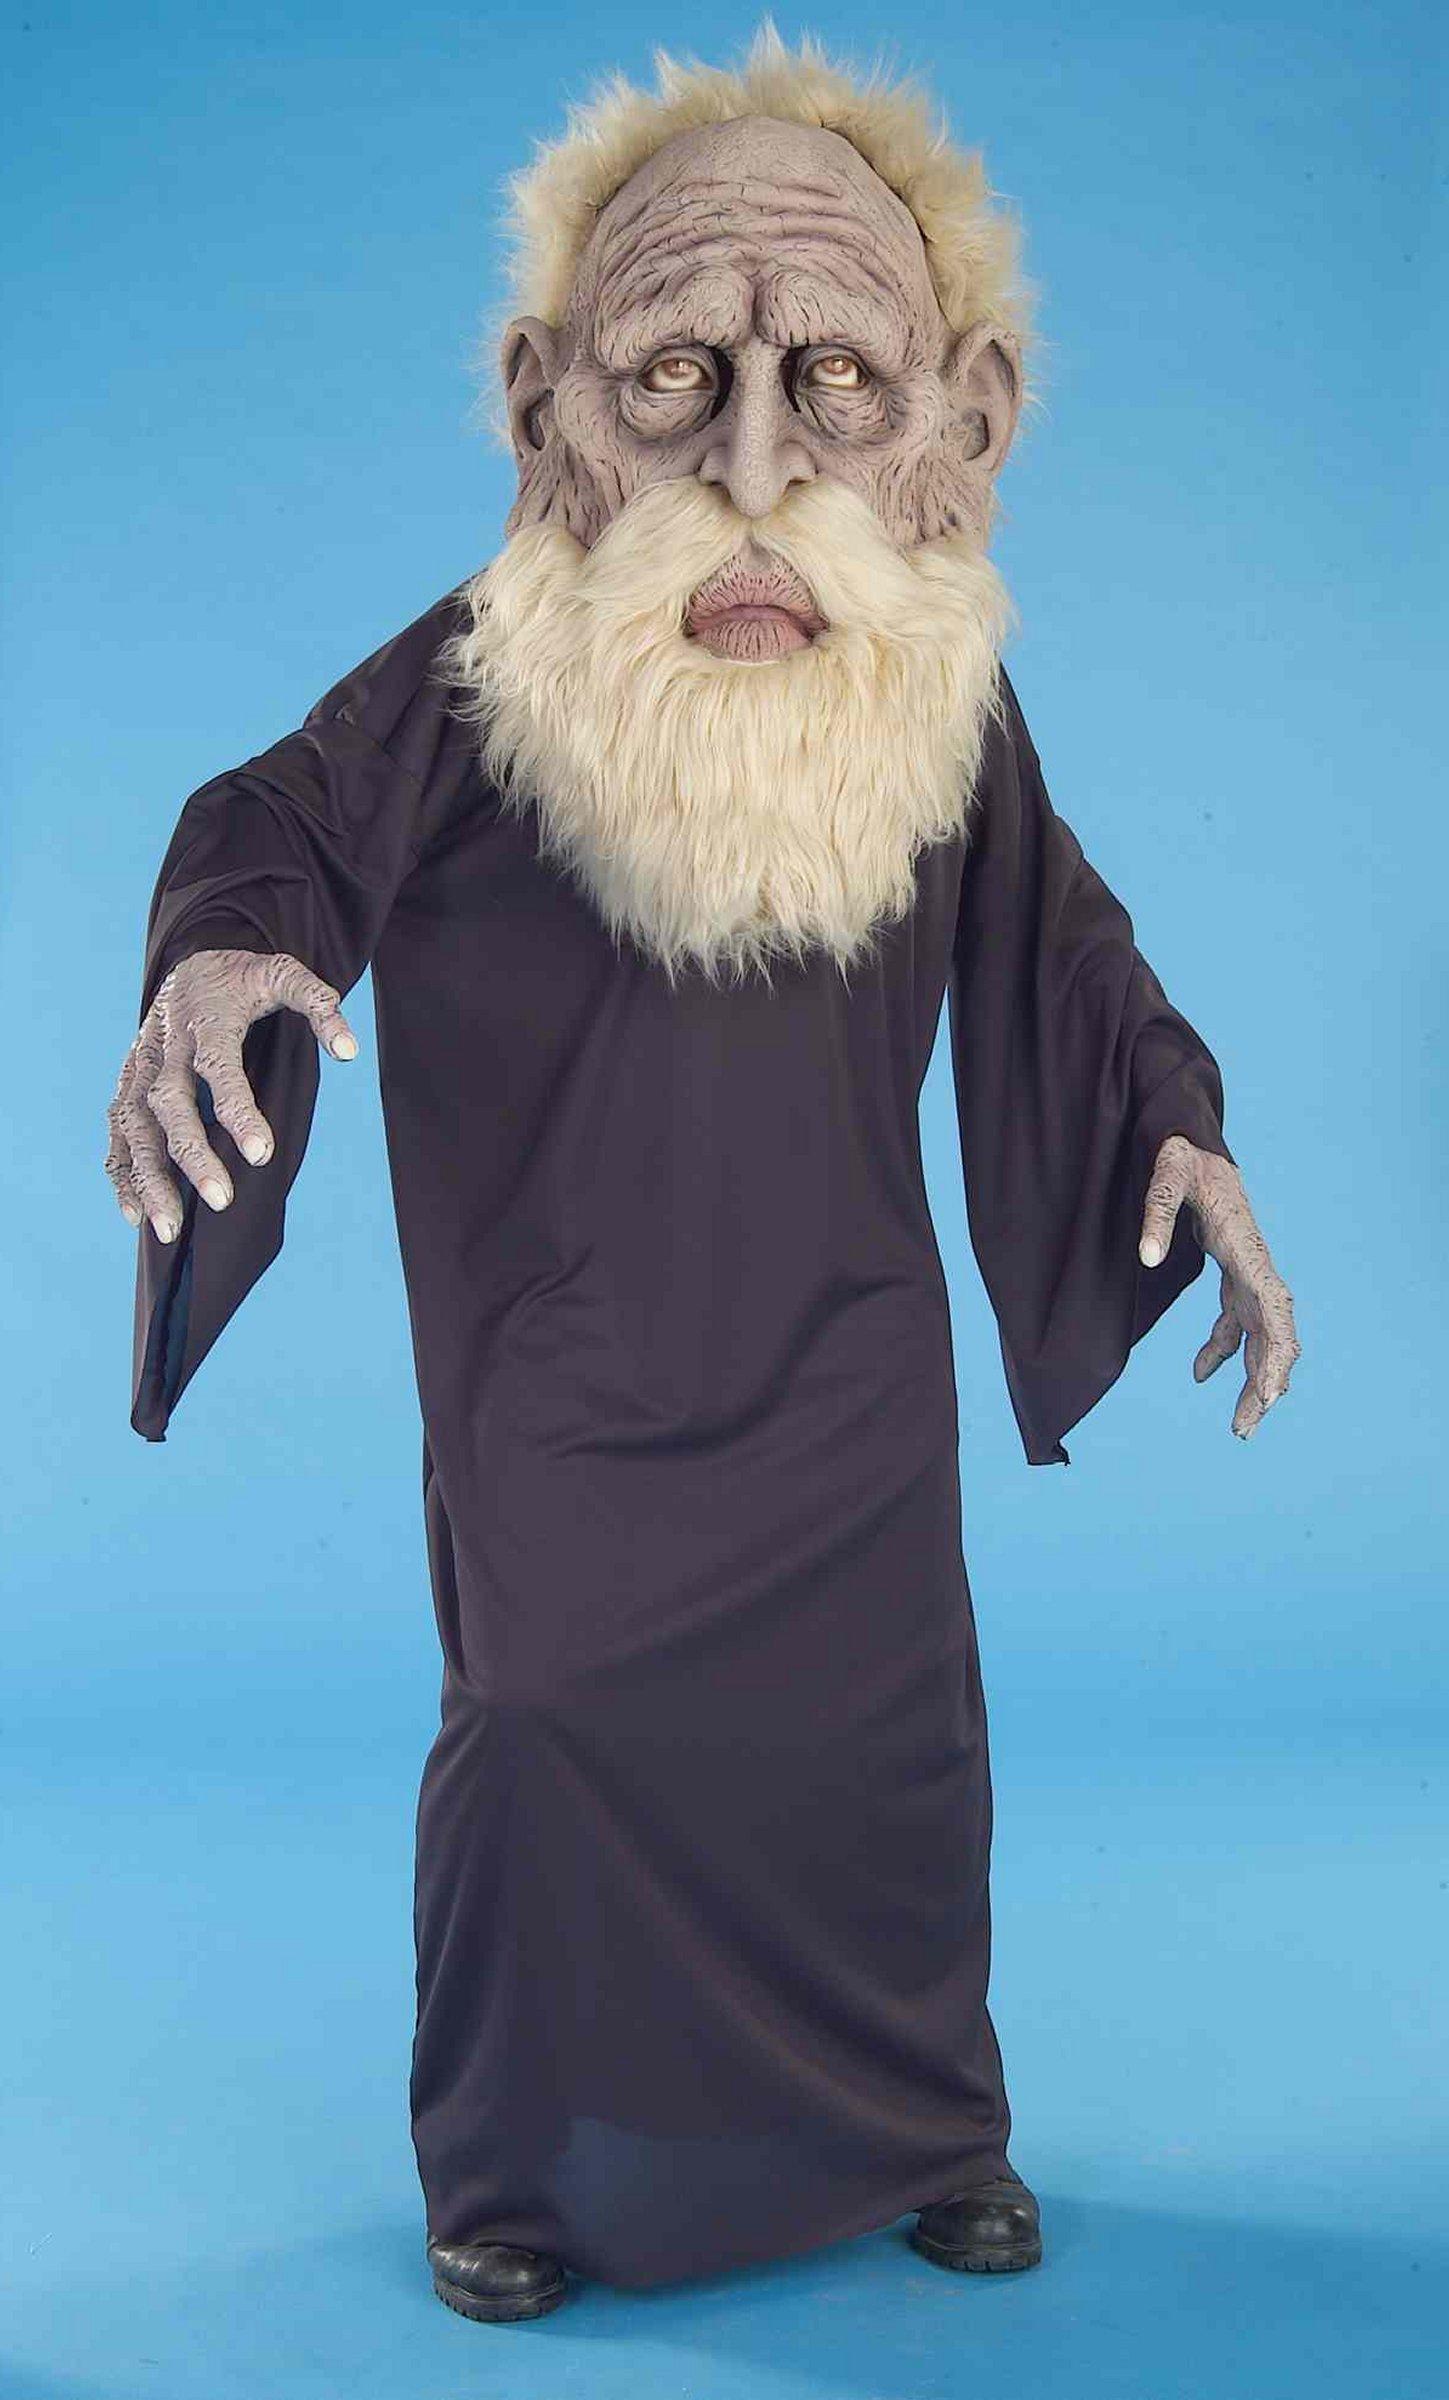 Costume-Troll-Parade